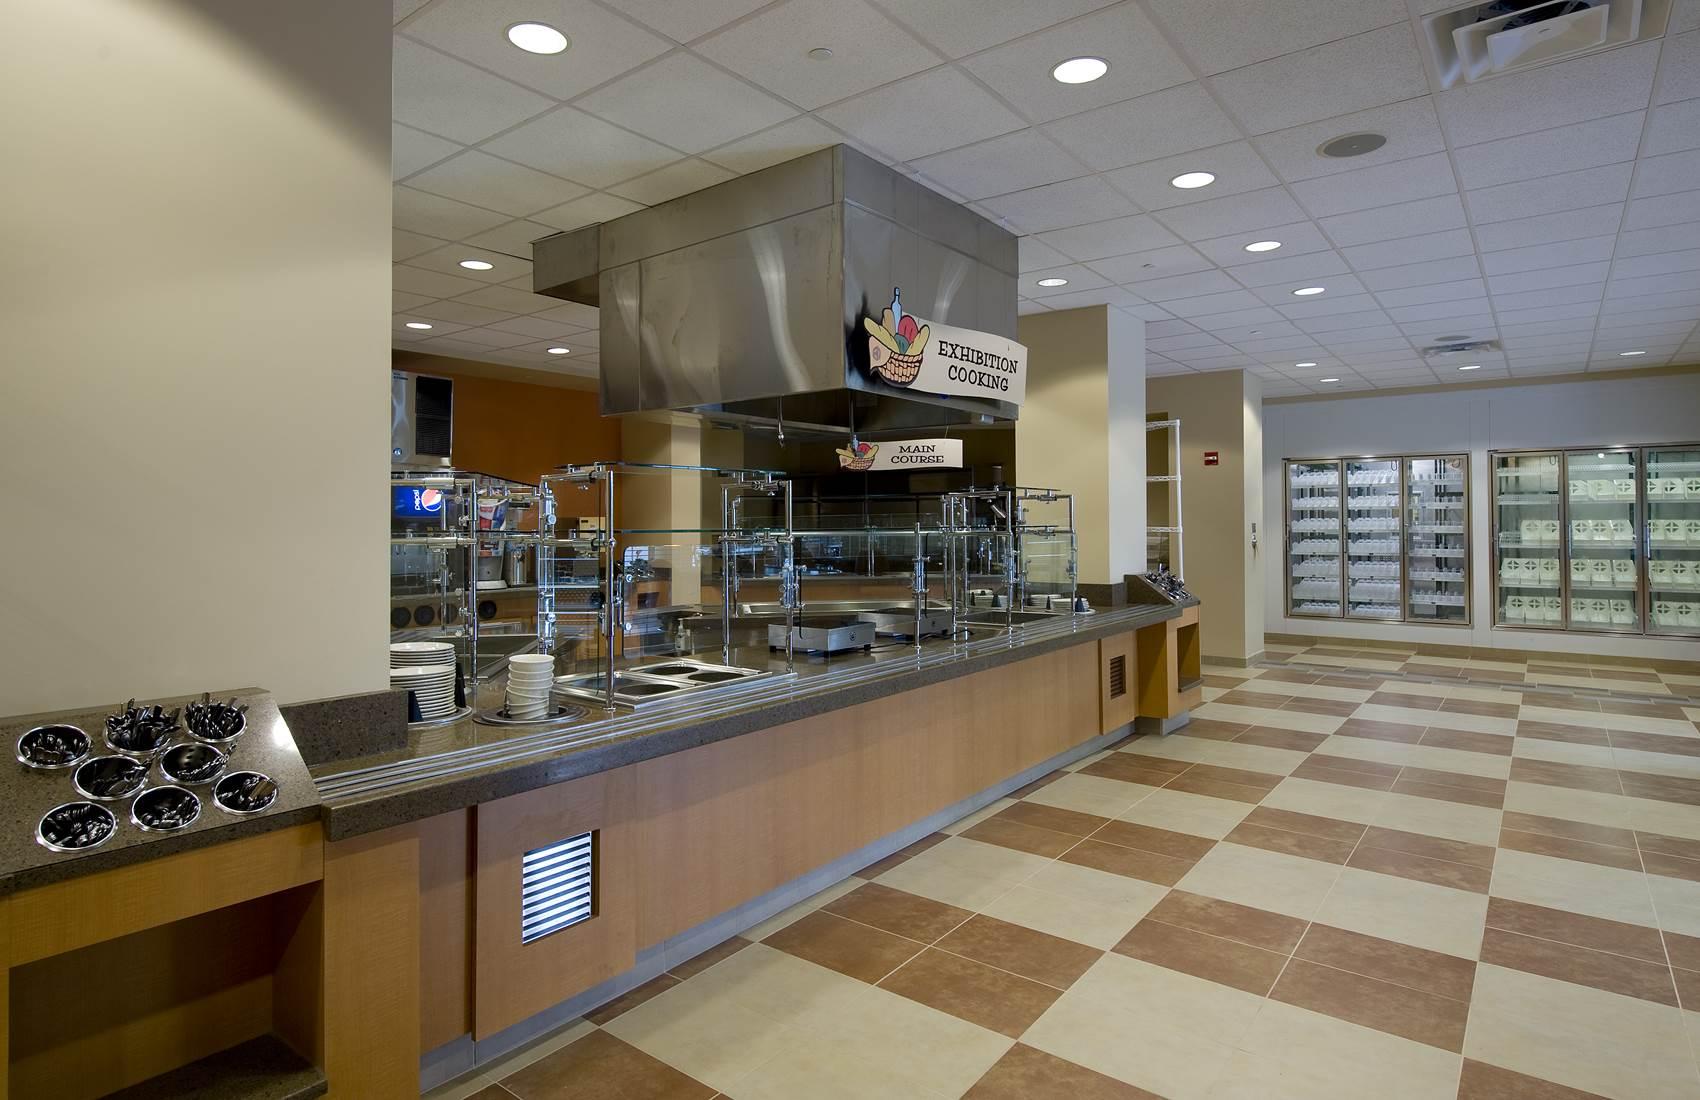 Food service area at Florida Hospital Memorial Medical Center